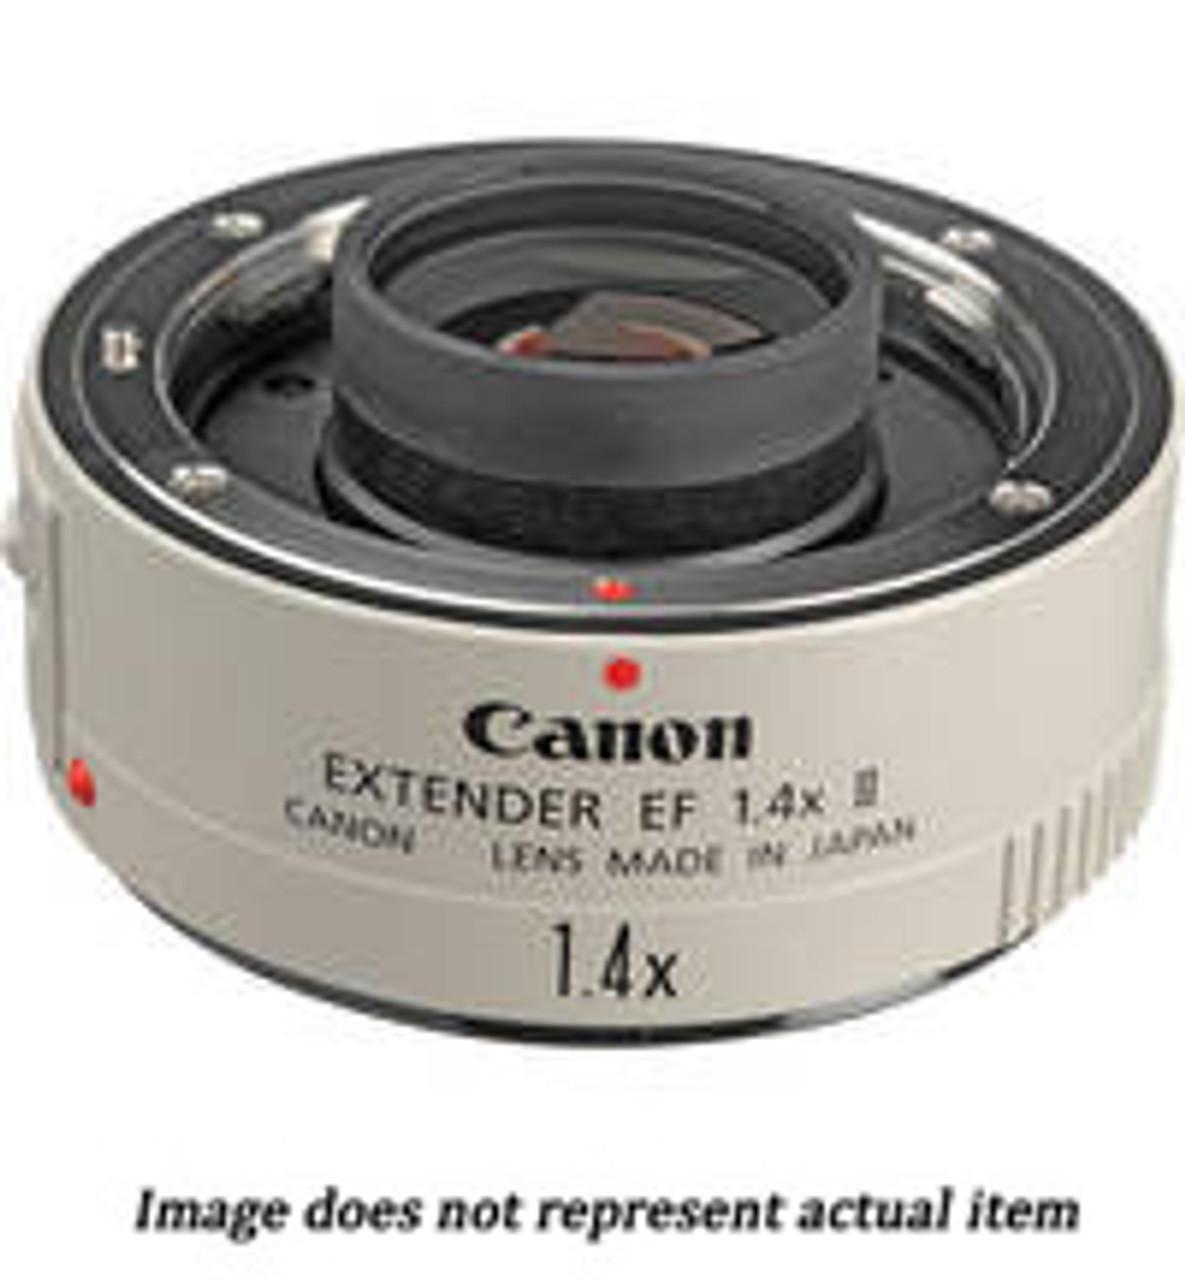 Canon EF 1.4x Extender II (Teleconverter) (USED) - S/N 116896